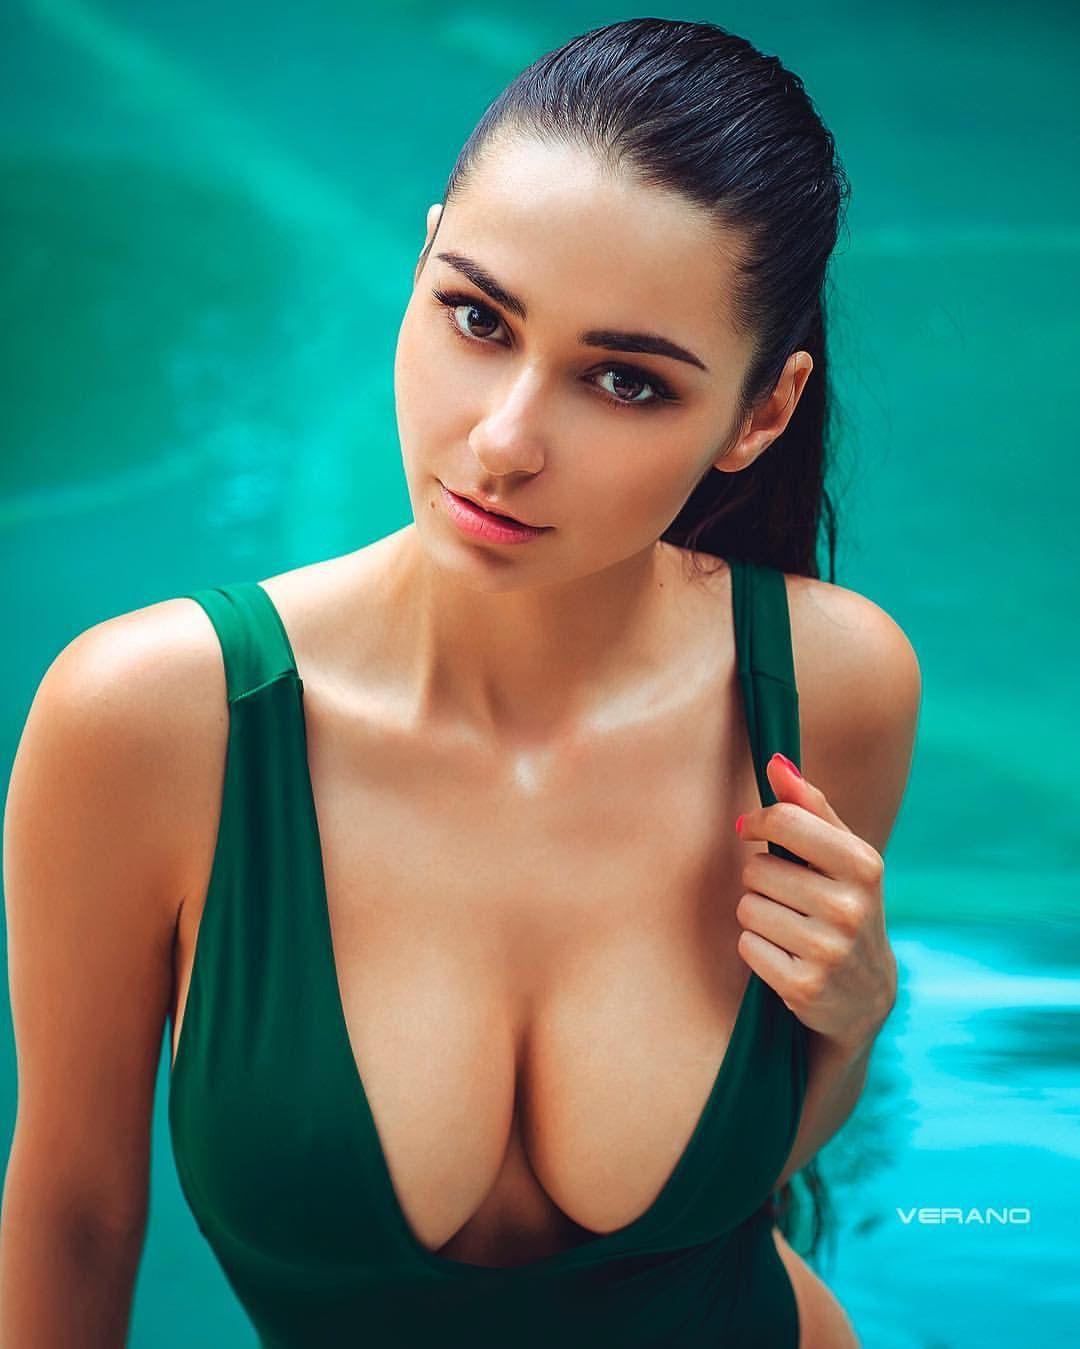 Ijhftc helga lovekaty james ium just here for the cleavage in